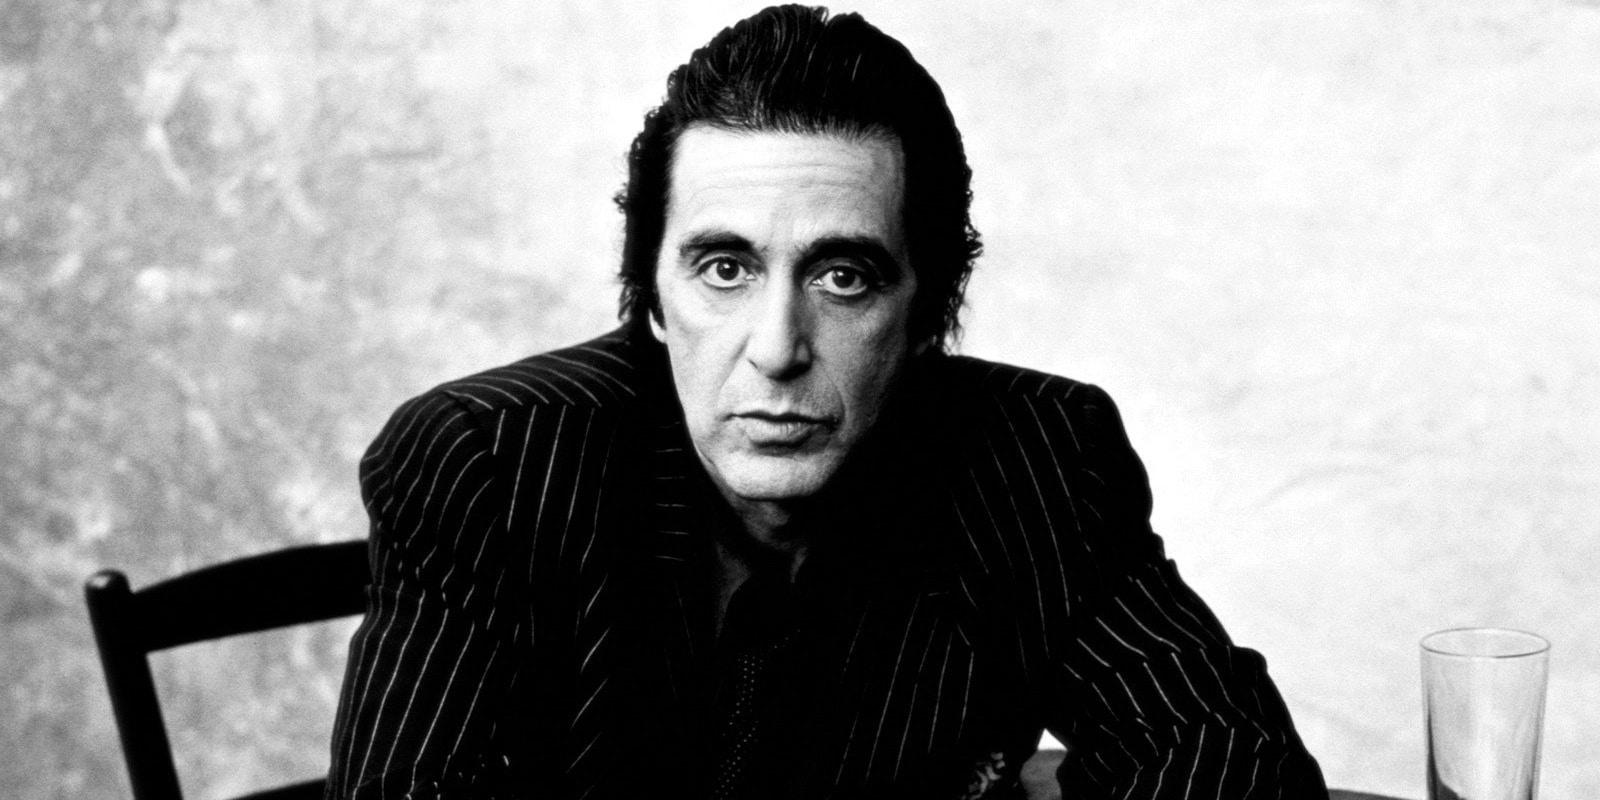 Al Pacino Net Worth 2017-2016, Biography, Wiki - UPDATED ...